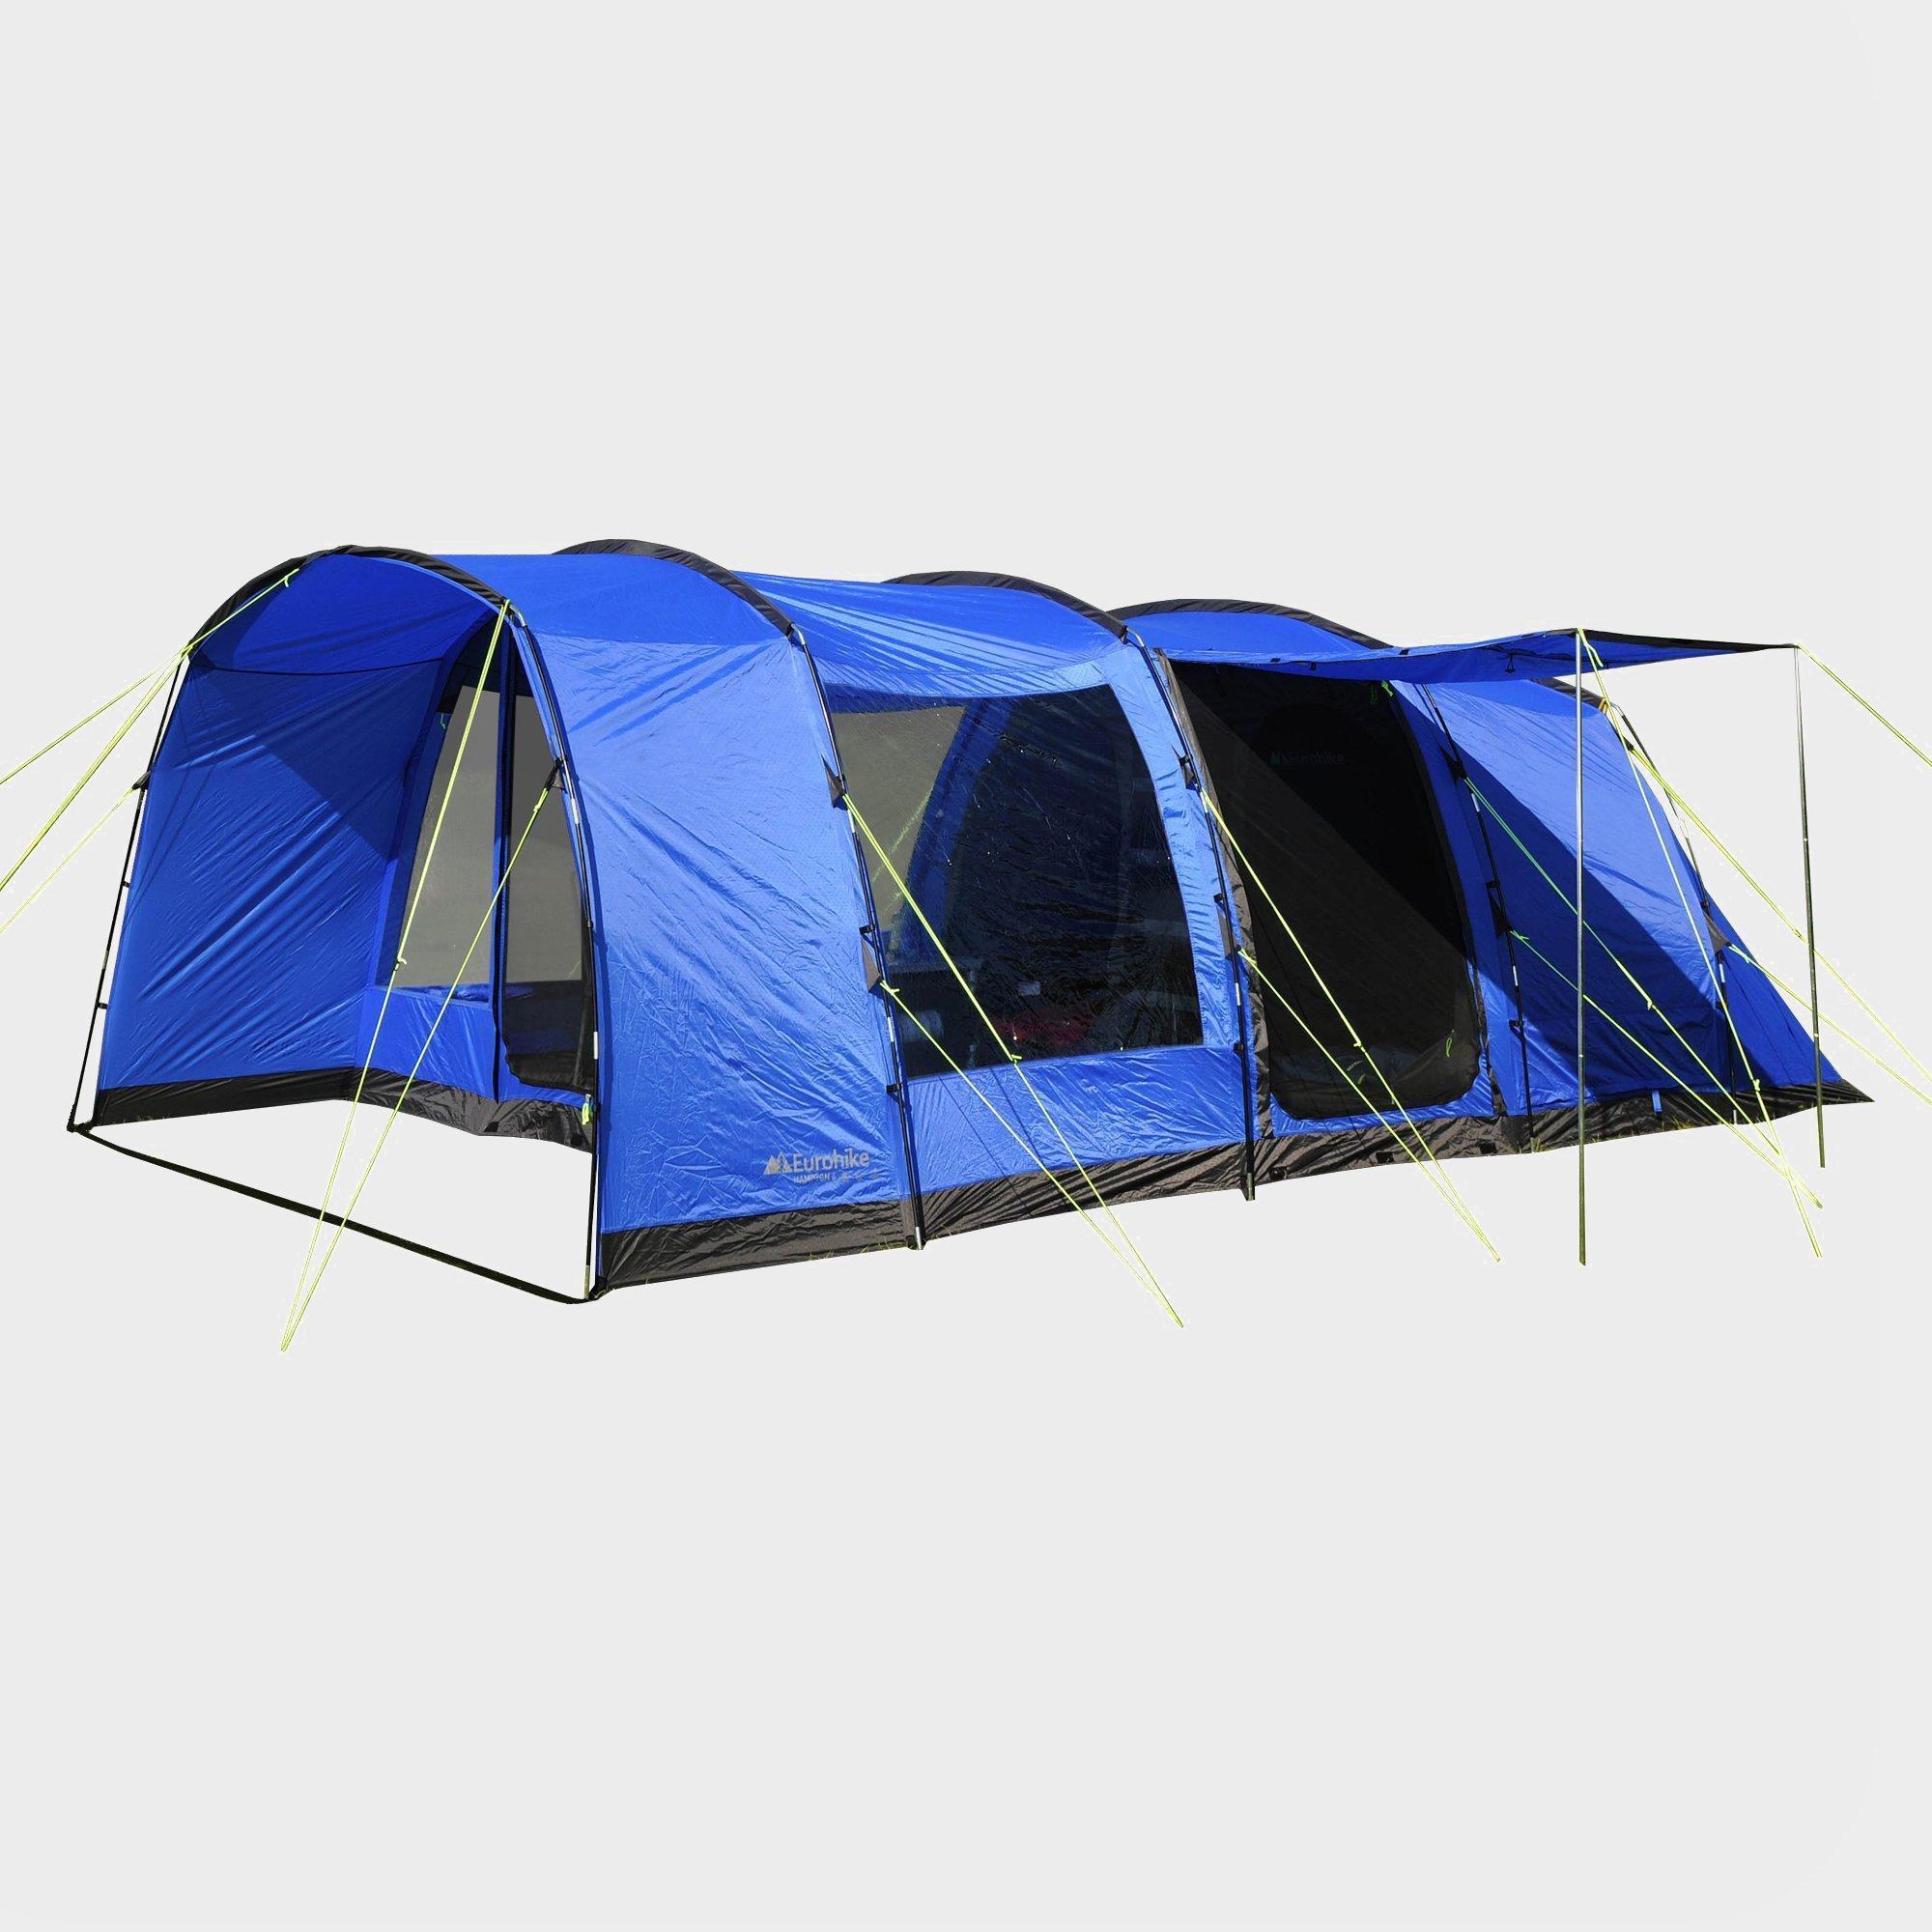 H&ton 6 Person Tent & Eurohike Hampton 6 Person Tent